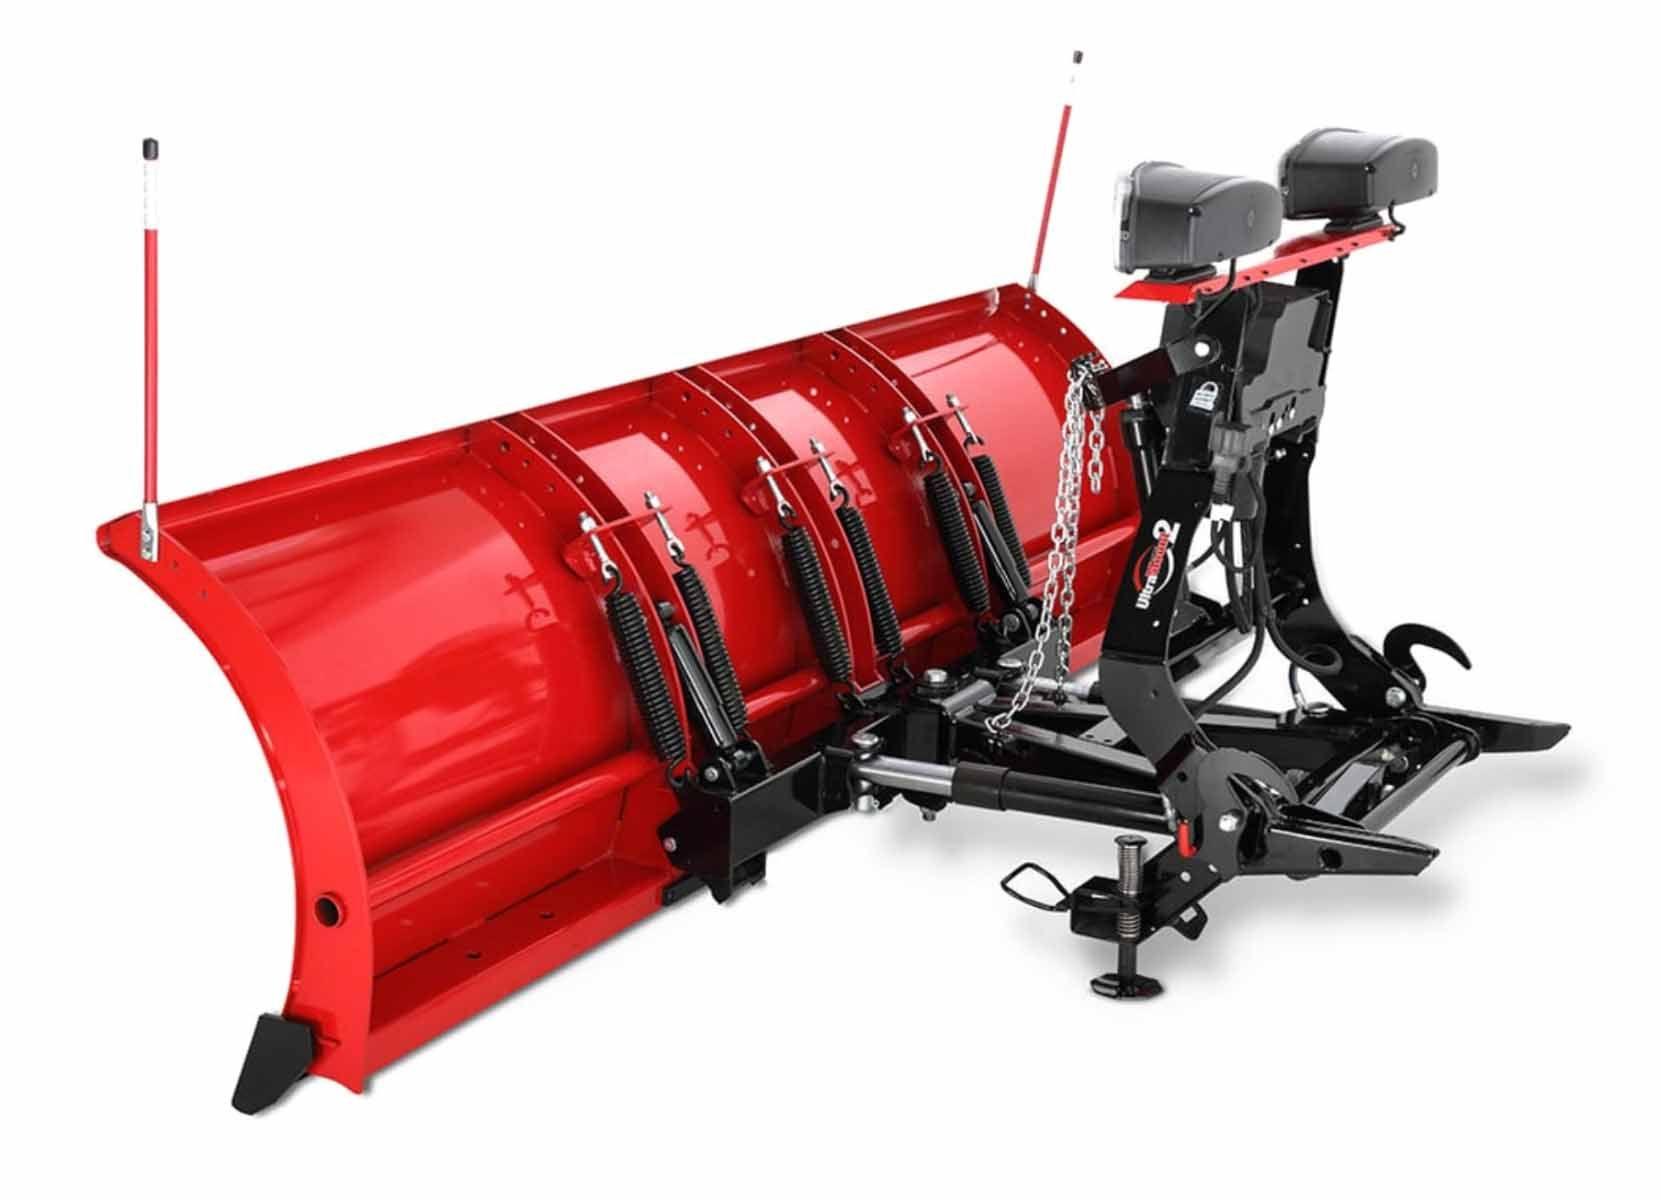 Western 9' Oscillation Skid Steer PRO Plow